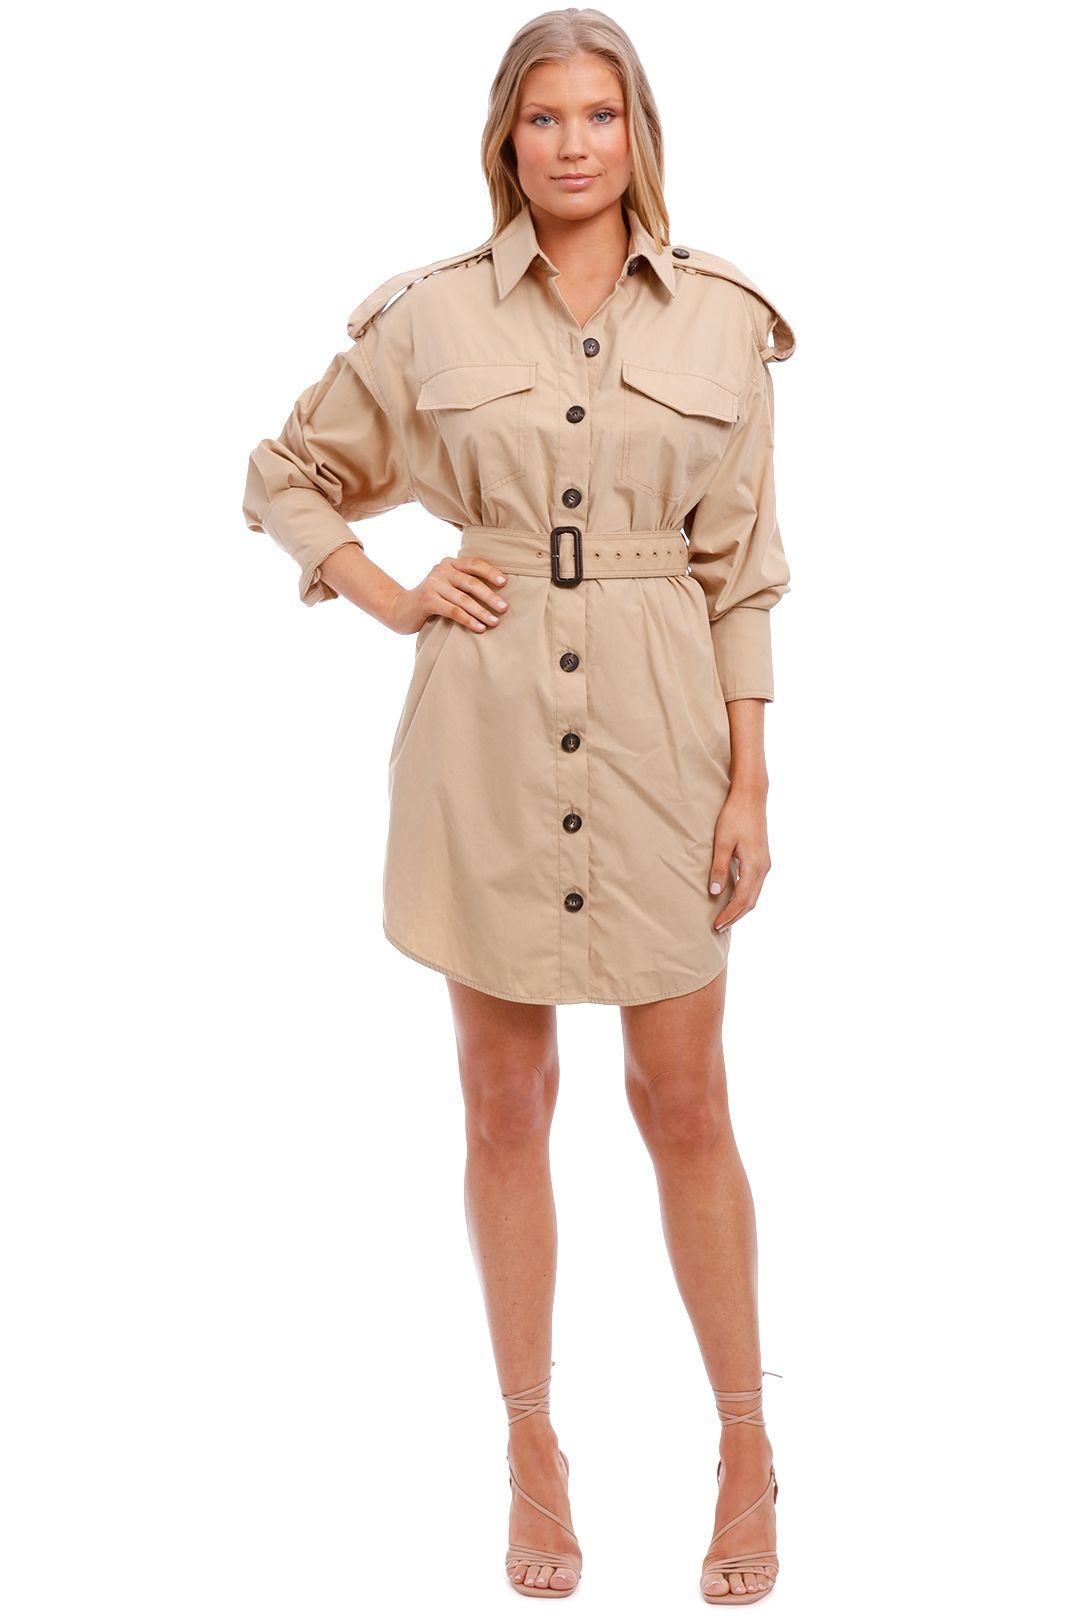 Camilla and Marc Frank Mini Shirt Dress beige